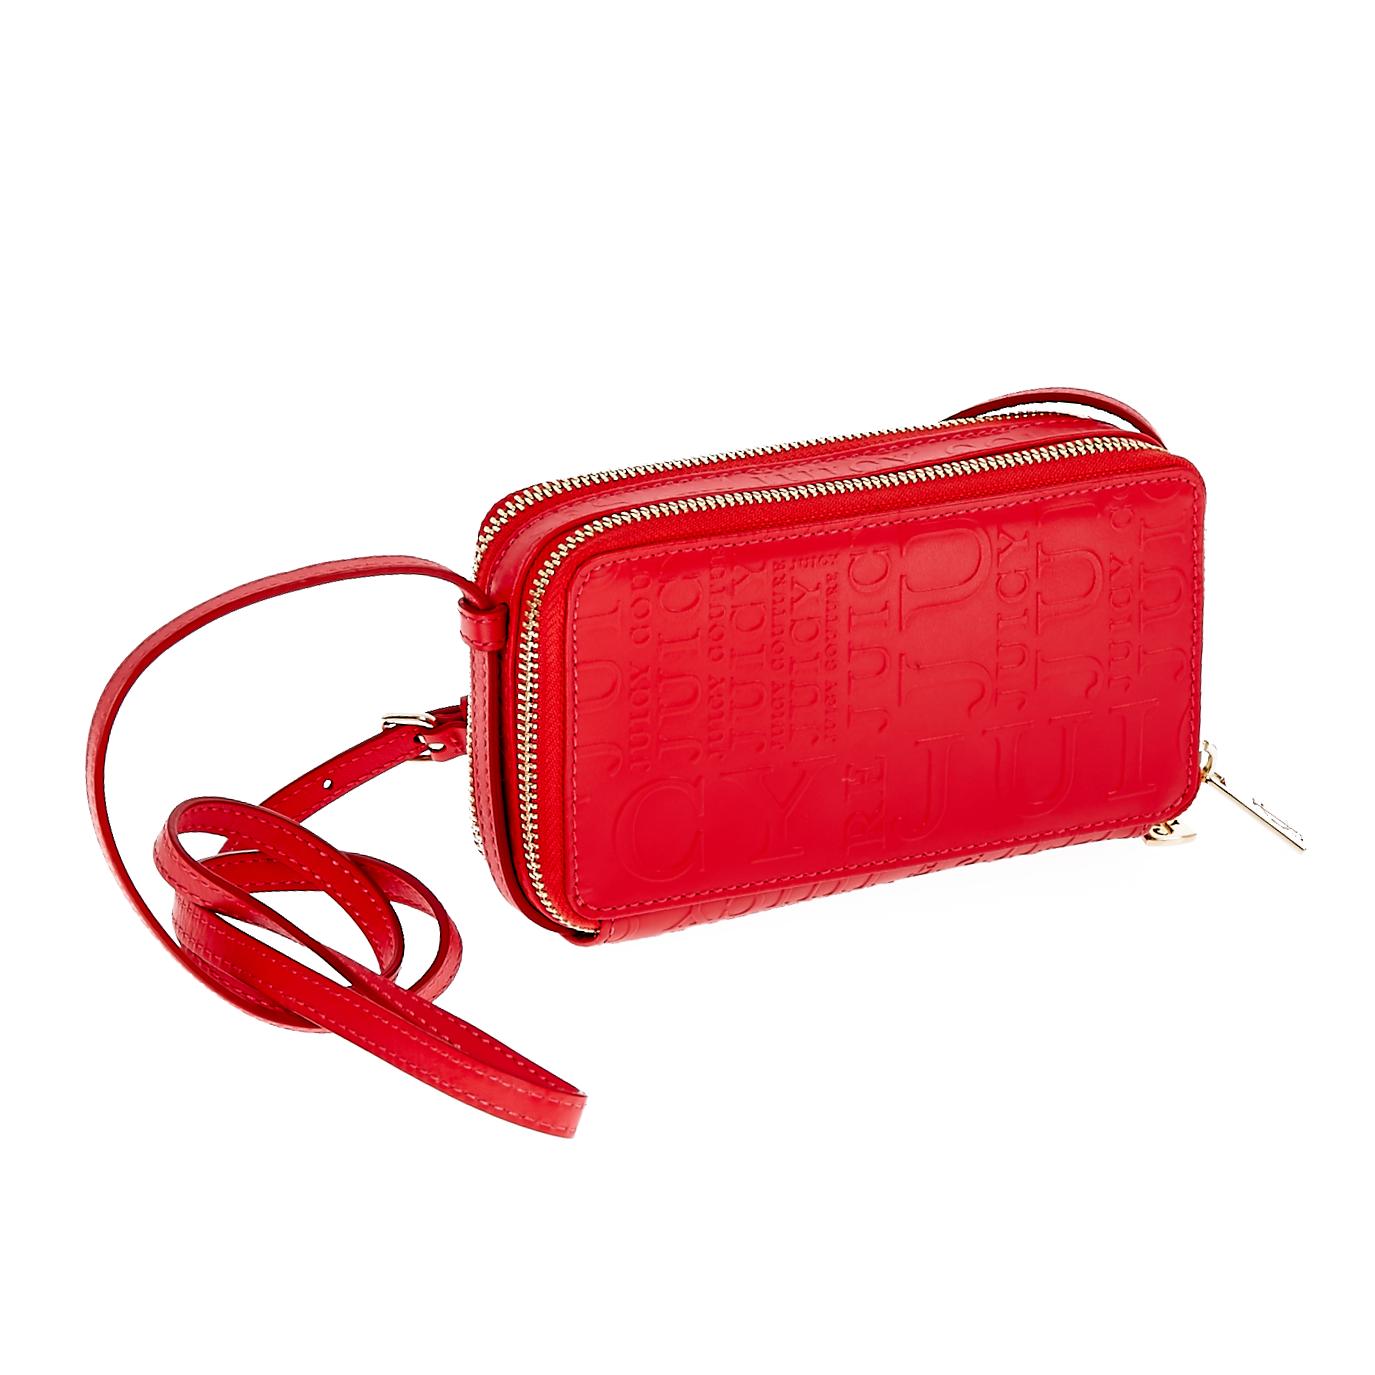 JUICY COUTURE – Γυναικεία τσάντα Juicy Couture κόκκινη 1441289.0-0045